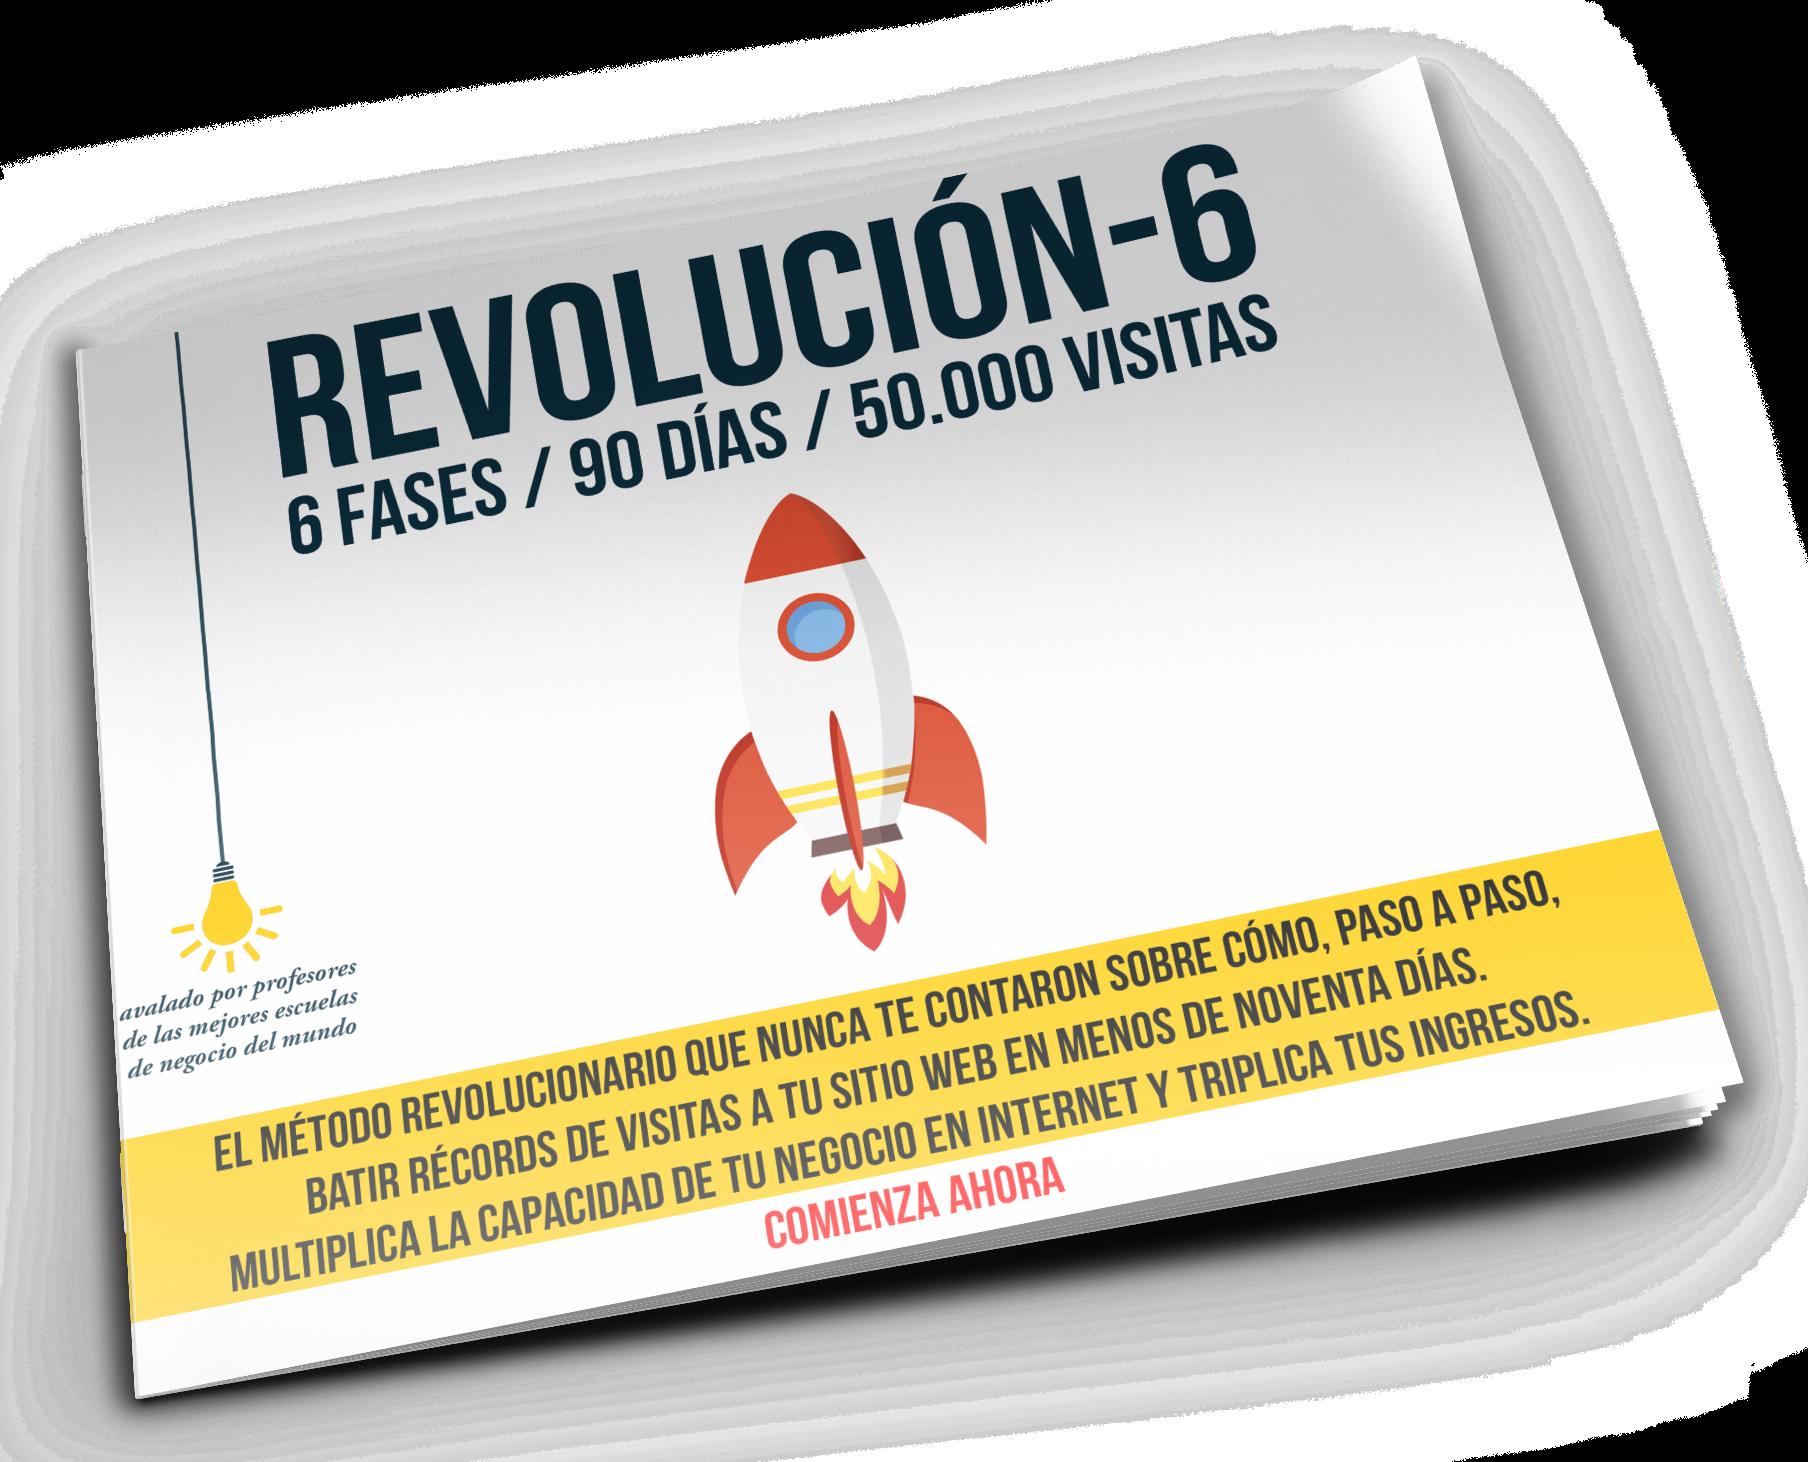 Portada Revolucion 6